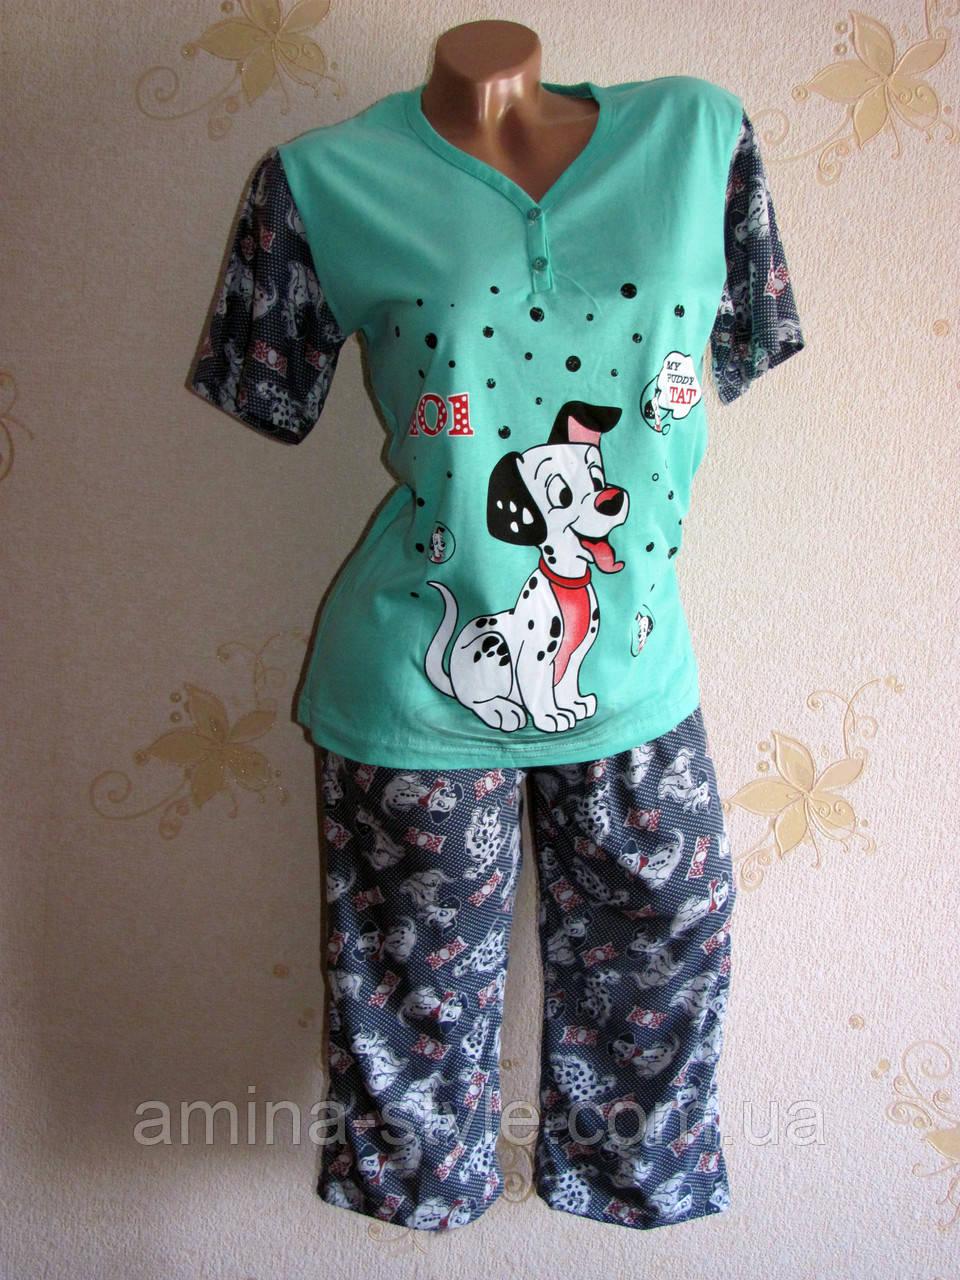 Пижама футболка и бриджи хлопок, размер L